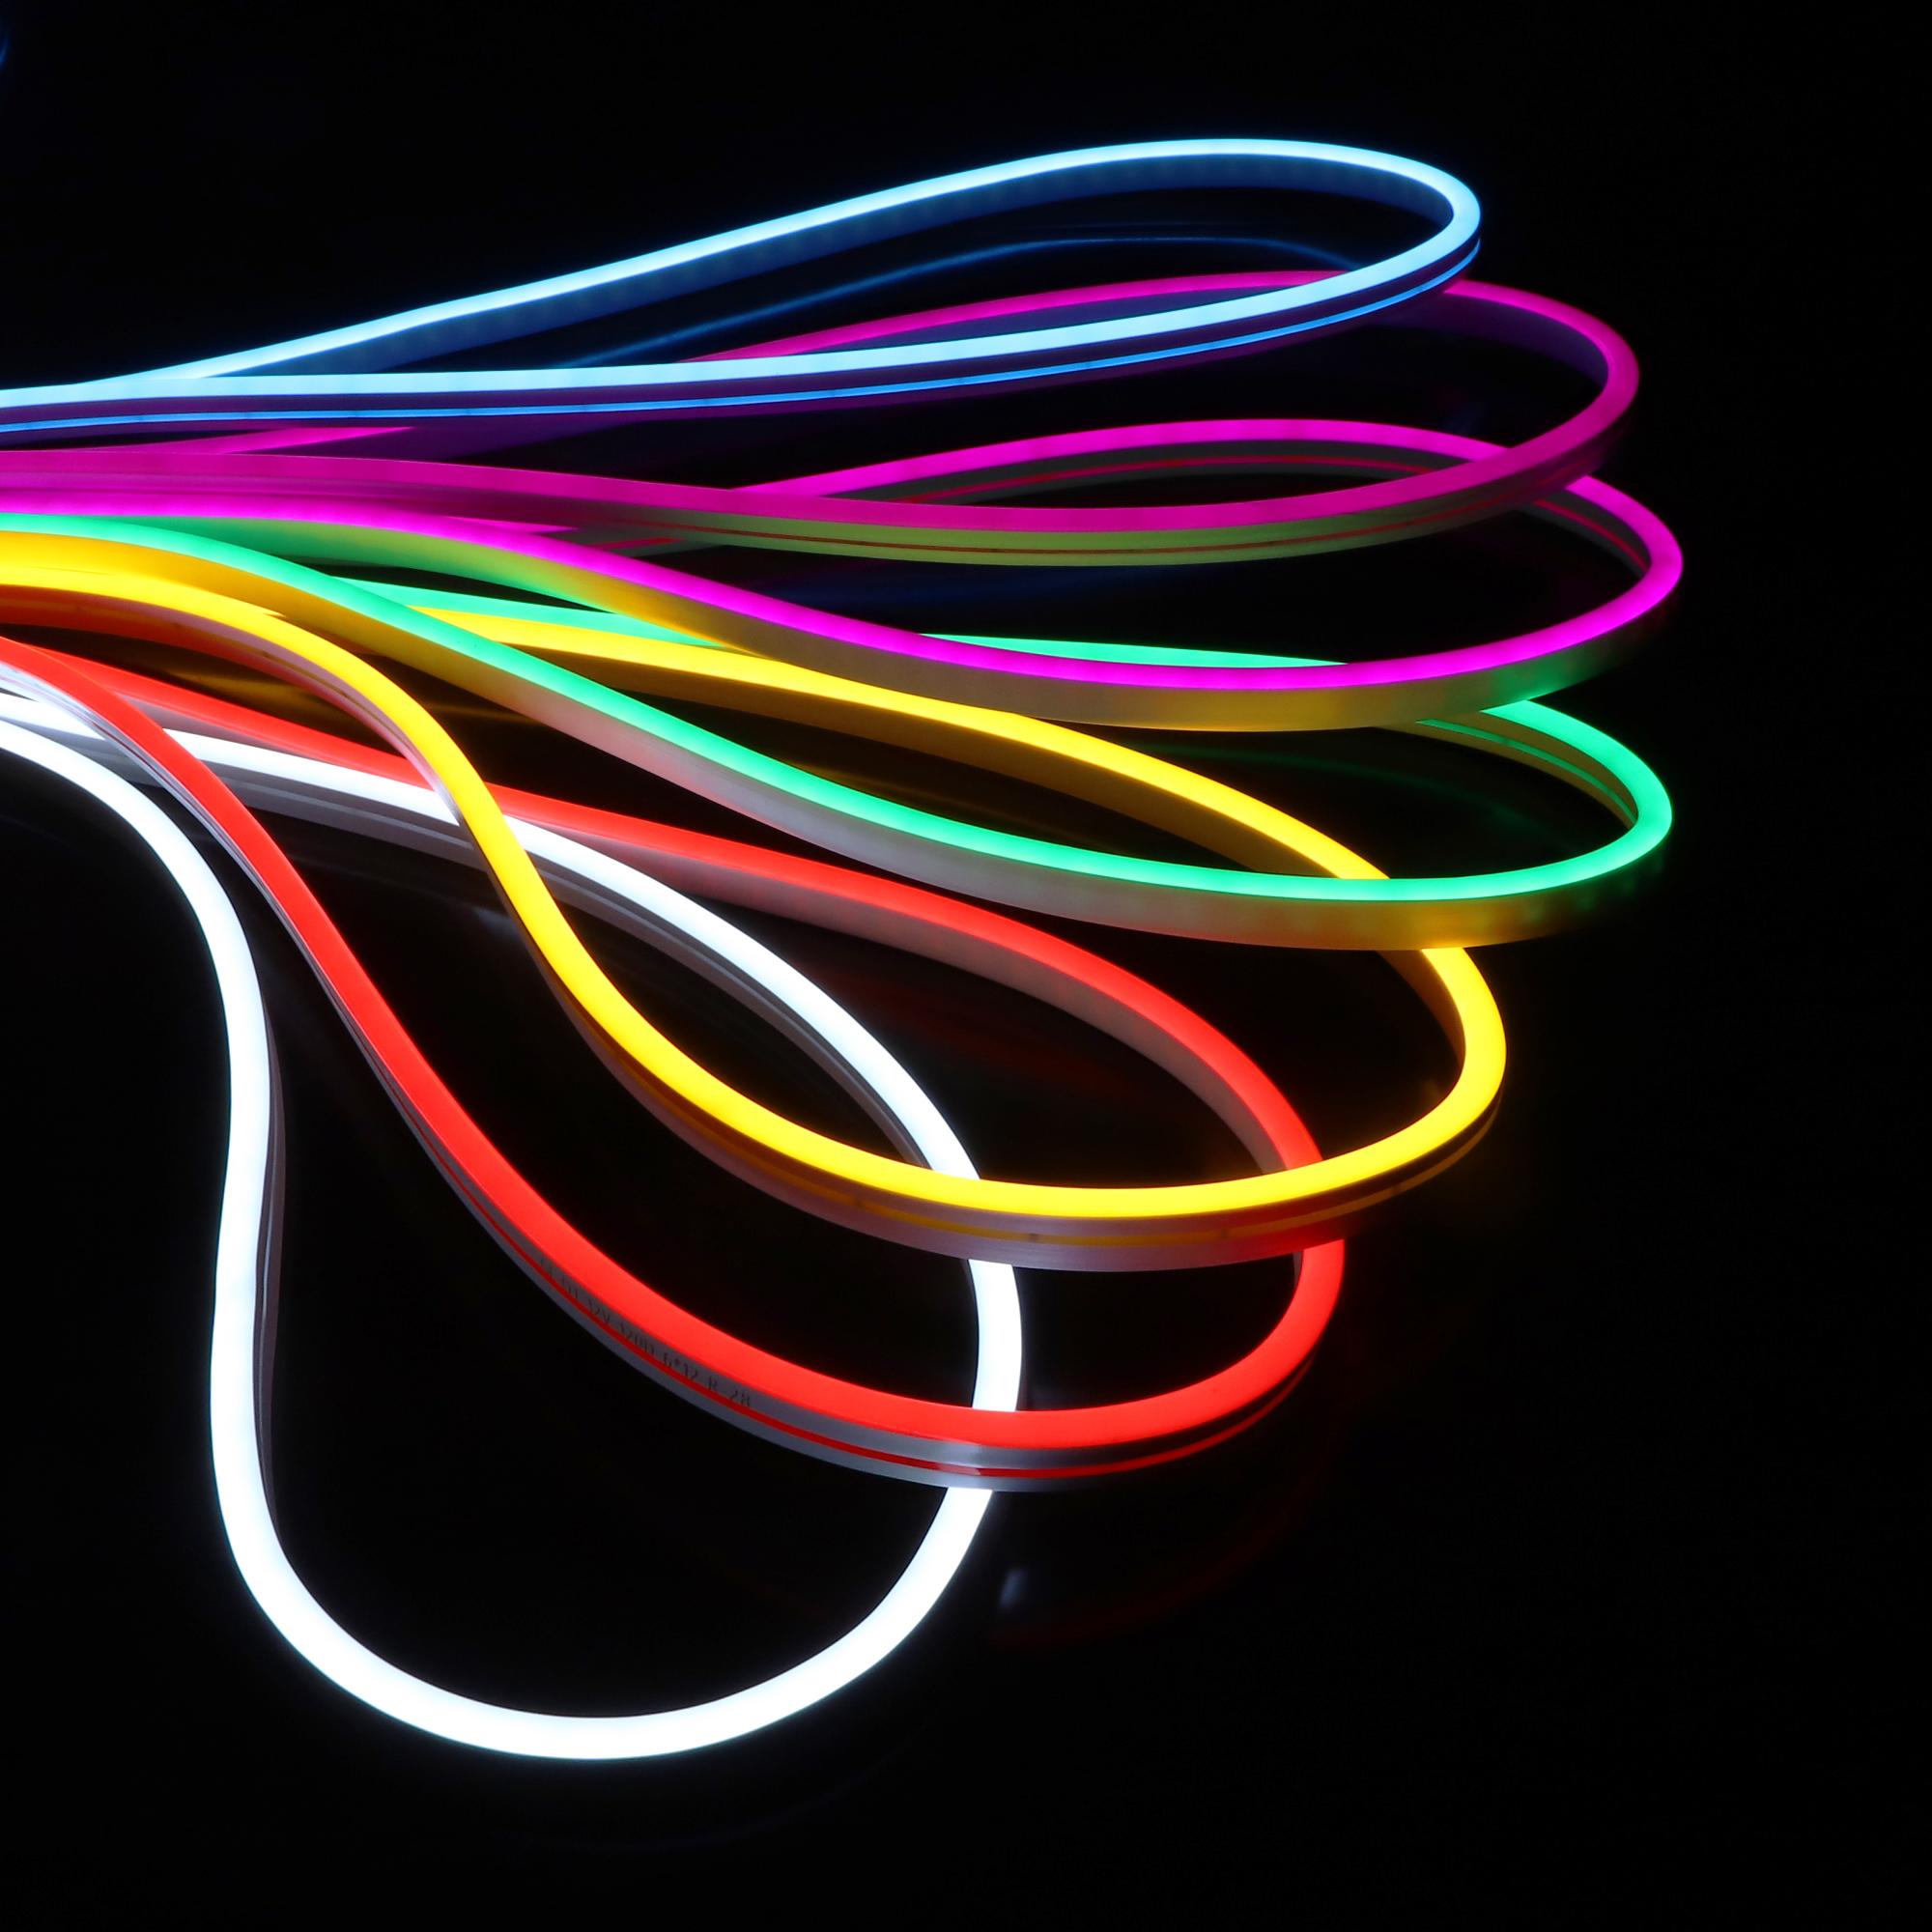 New led neon flexible strip 12v 24v Silicone flexible 6*12mm top view led neon flex light ip67